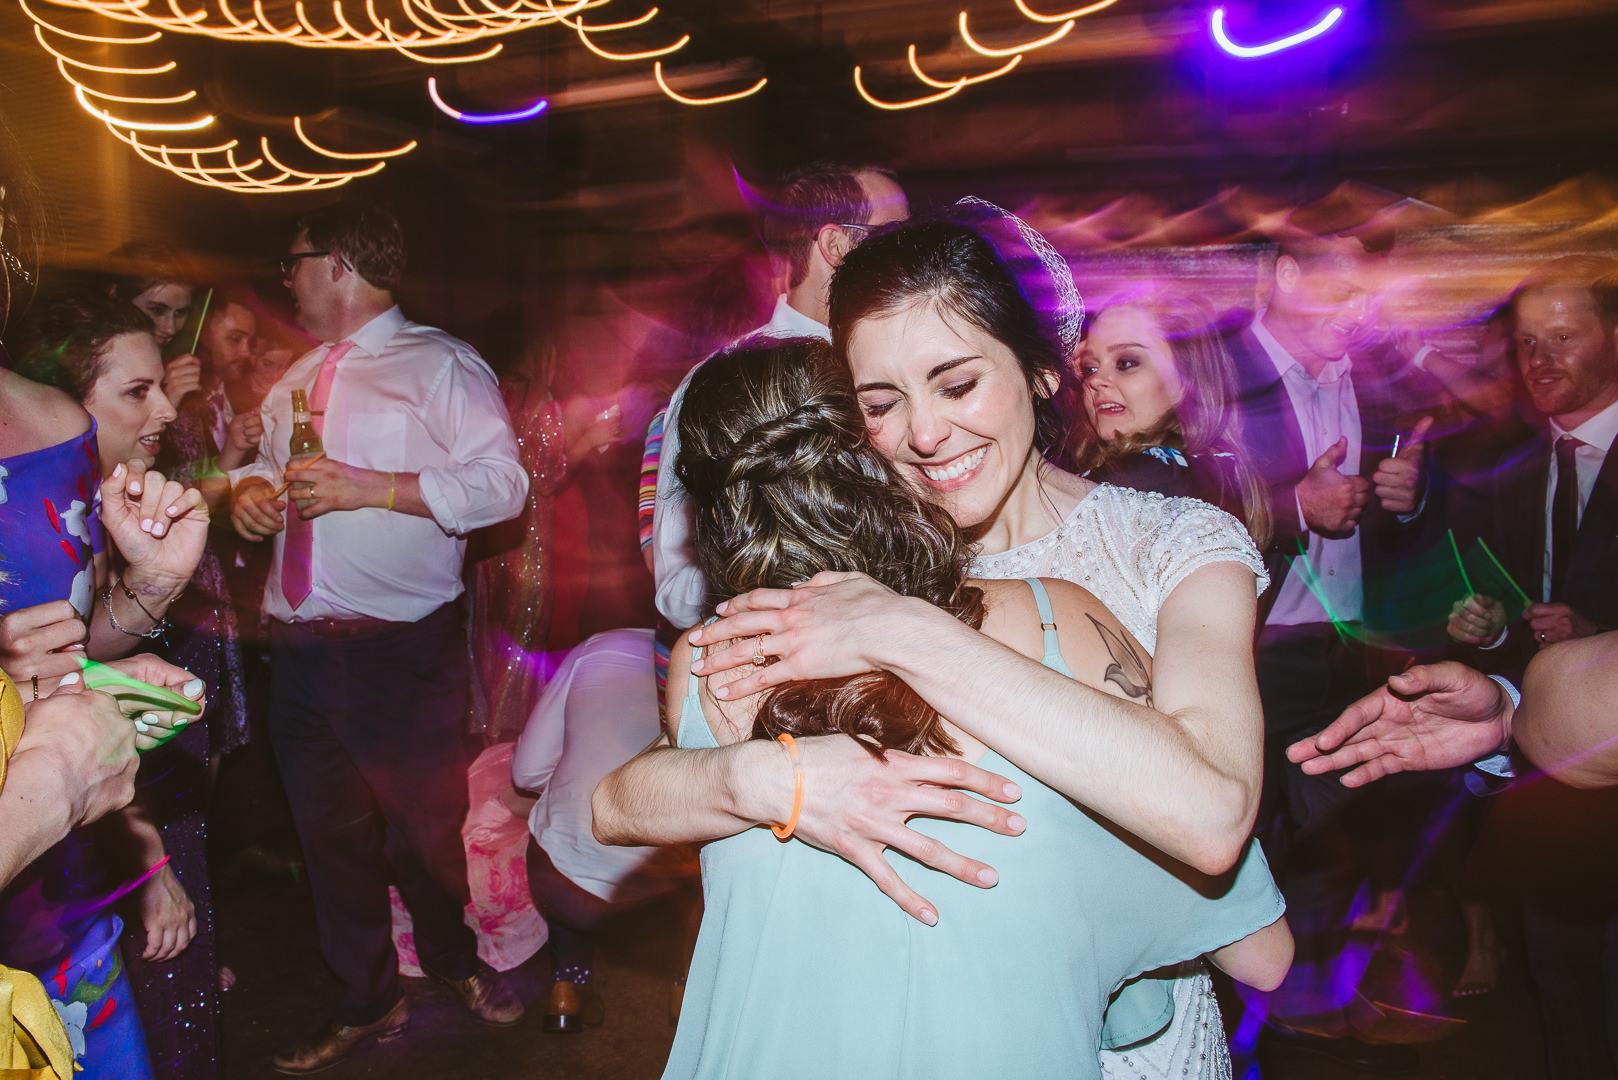 Wedding Dance - From my best wedding photos from 2019